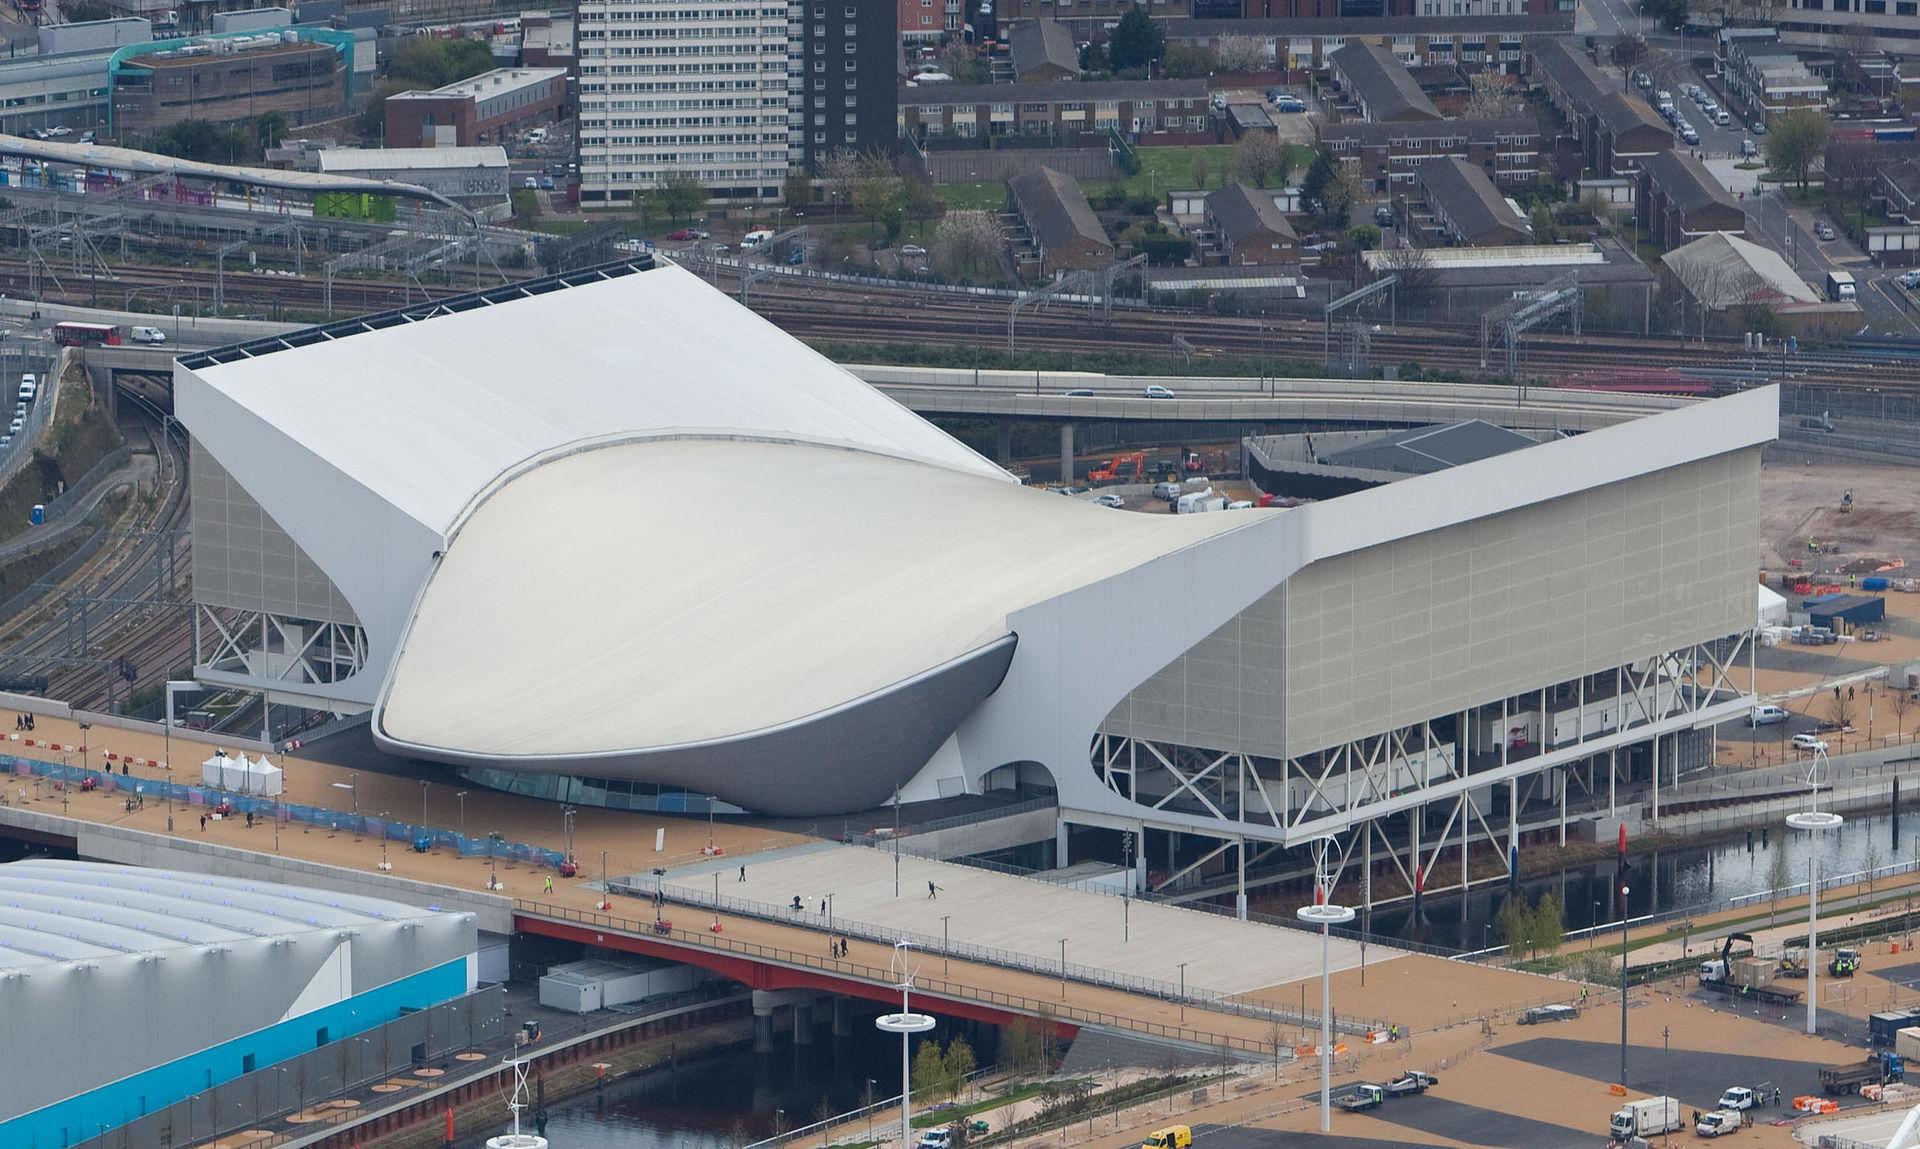 Napravljen je za Olimpijske igre 2012. godine